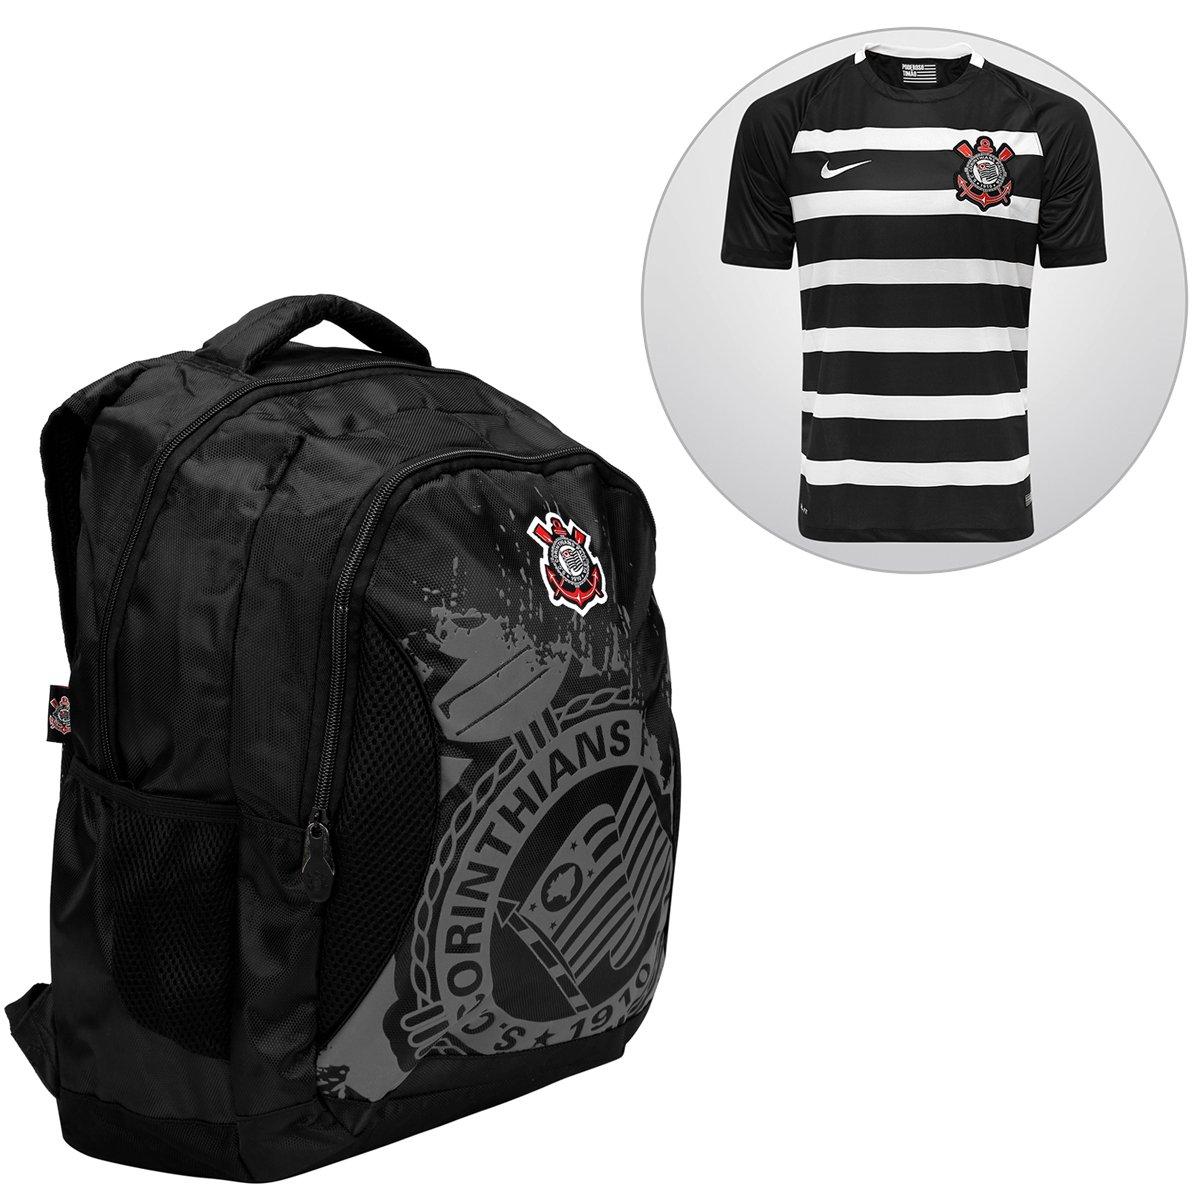 0d4f5f90b2b Kit Camisa Nike Corinthians II 15 16 s nº + Mochila Corinthians - Compre  Agora